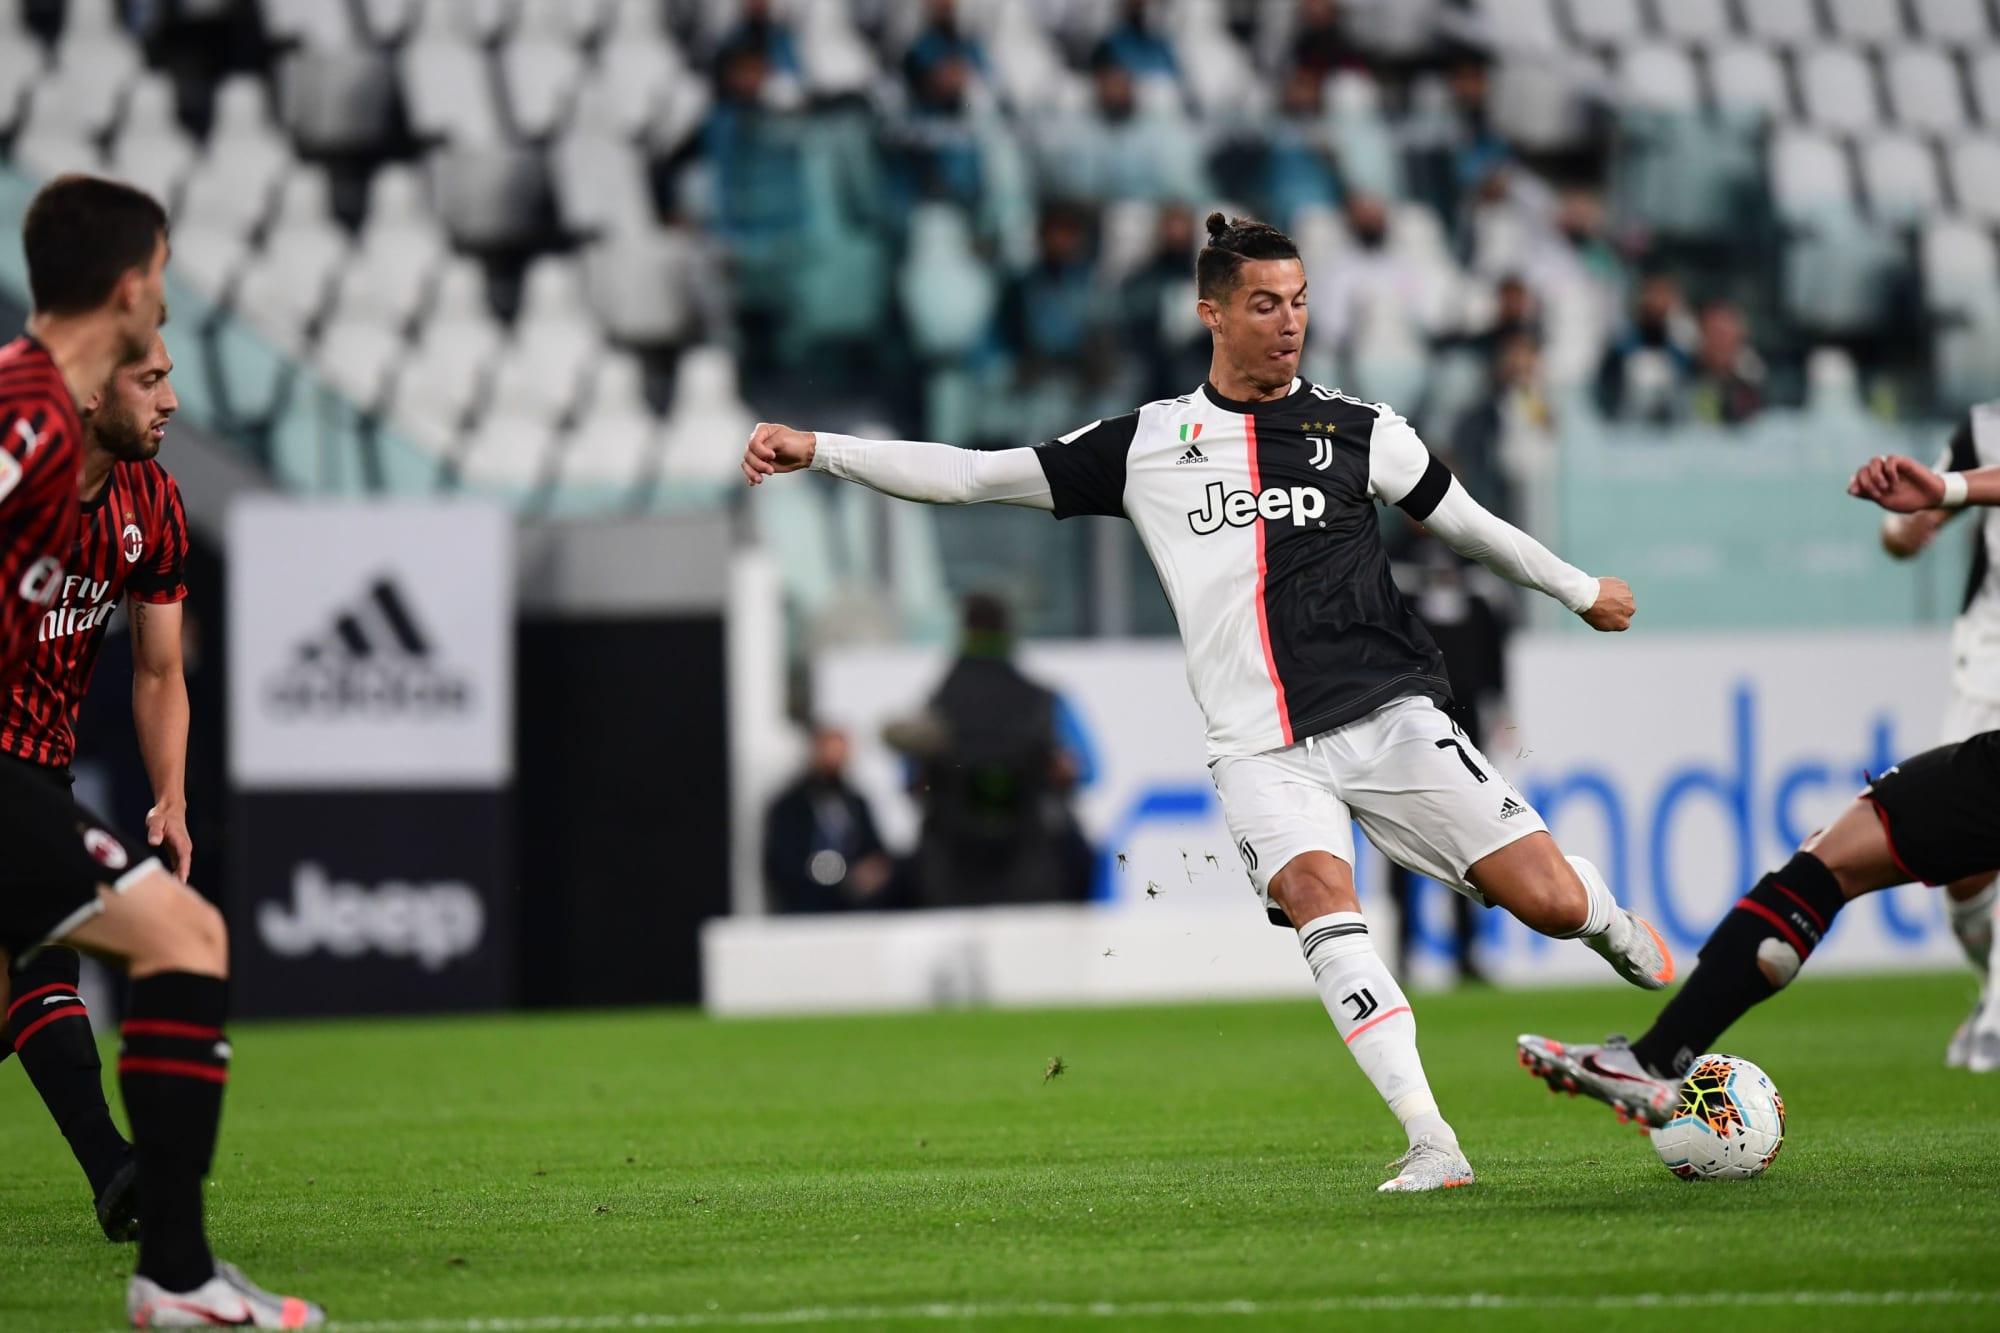 Juventus Vs Napoli Live Stream Watch Coppa Italia Final Online